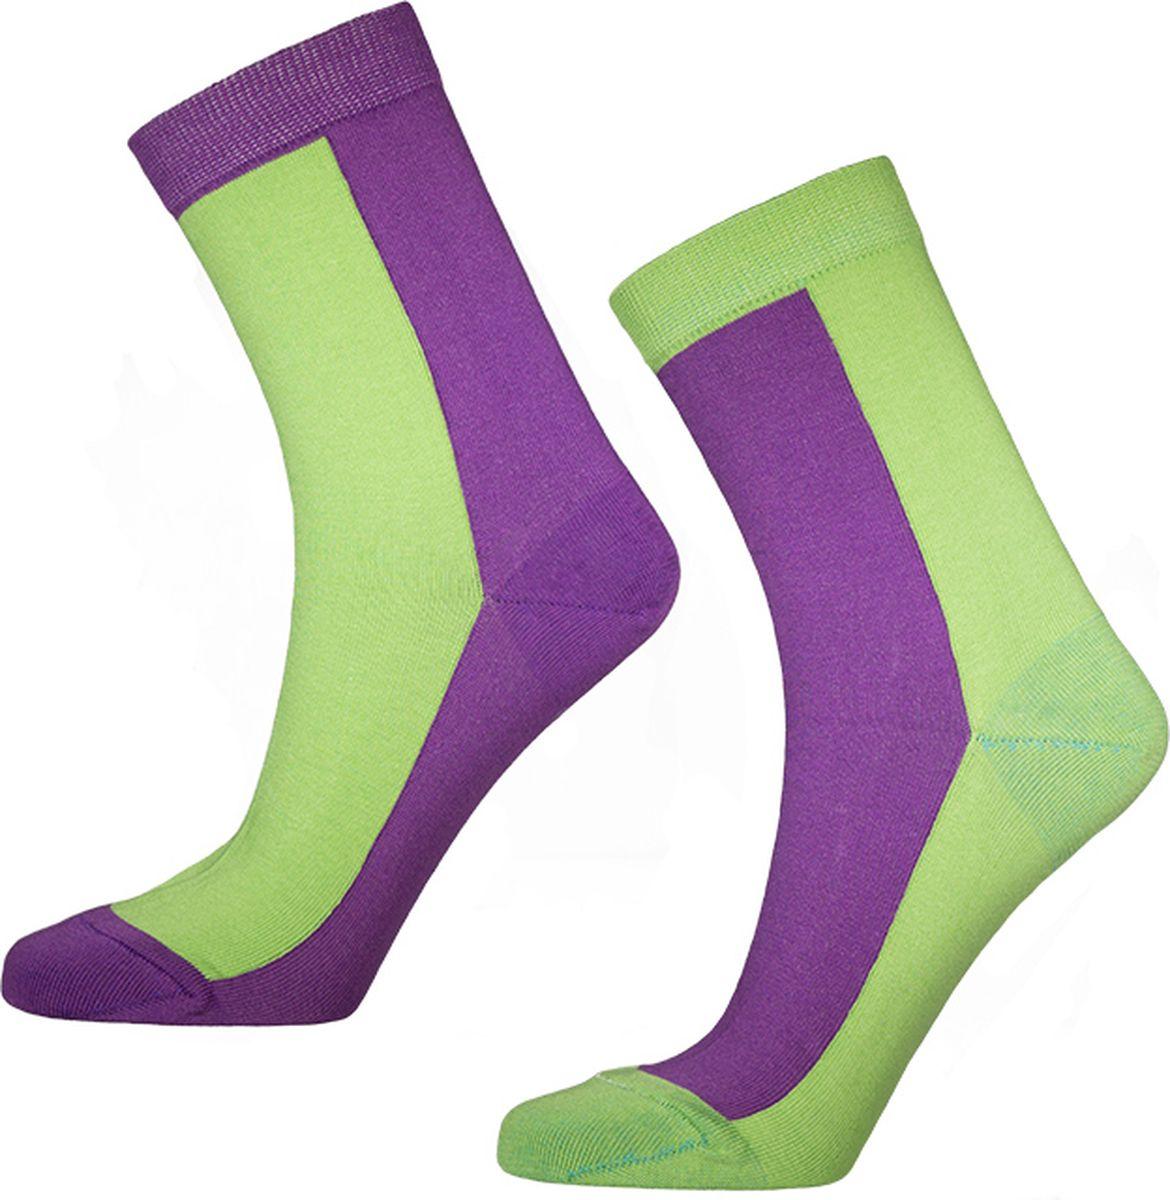 Носки мужские Big Bang Socks, цвет: фиолетовый, салатовый, 2 пары. d461. Размер 40/44 носки minecraft socks 3 pack green зеленые s 3 пары 11750